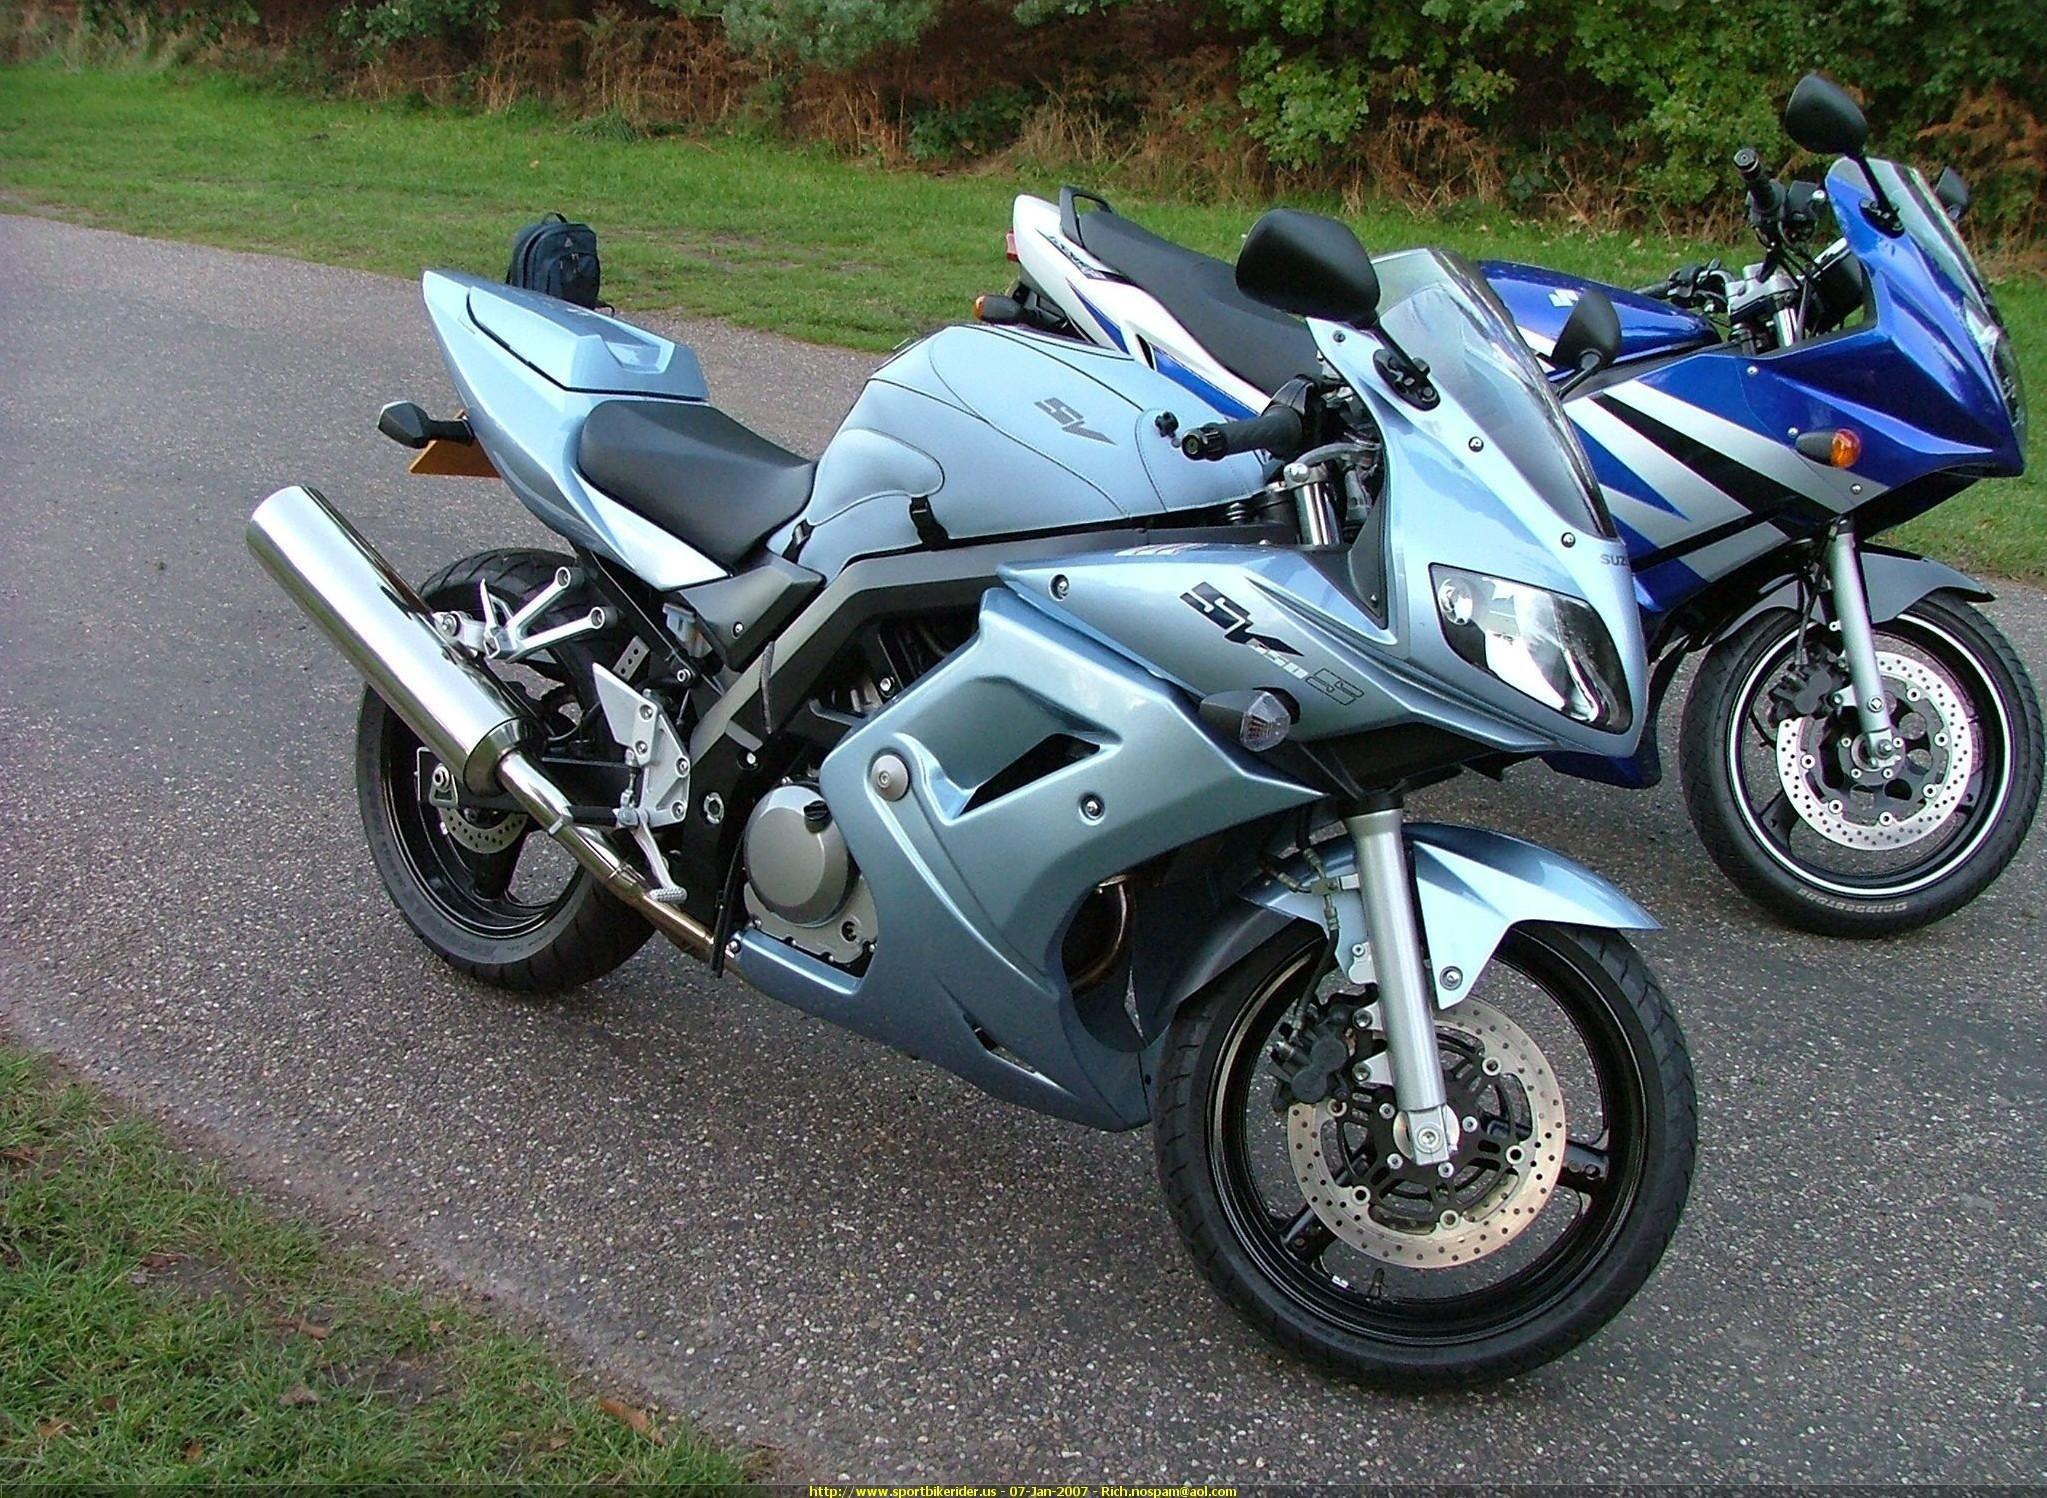 2006 Suzuki SV650s. love the winter chill color. | Awesome | Pinterest